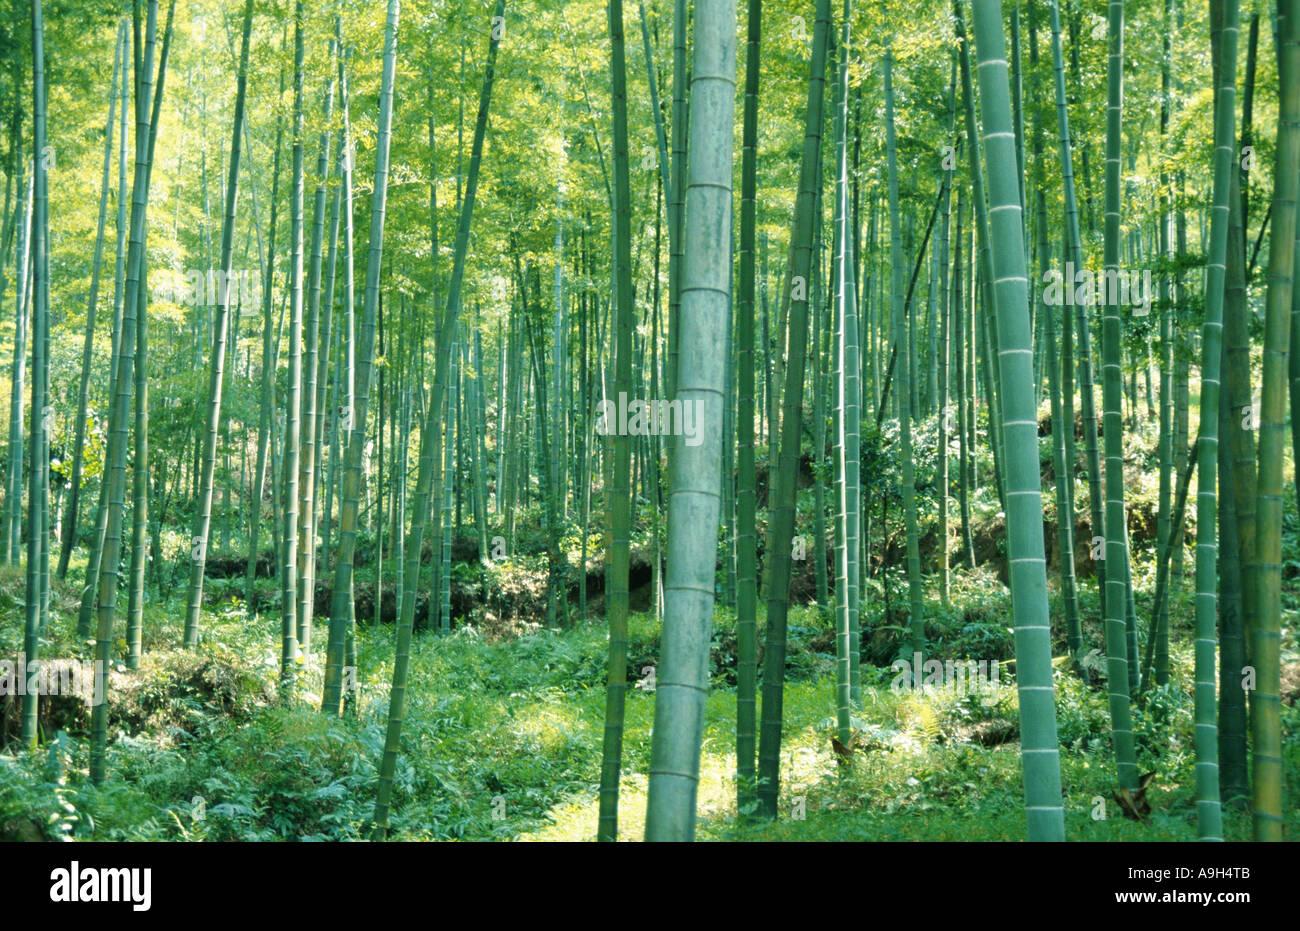 clumping bamboo (Bambusa spec.), bamboo forrest, China - Stock Image